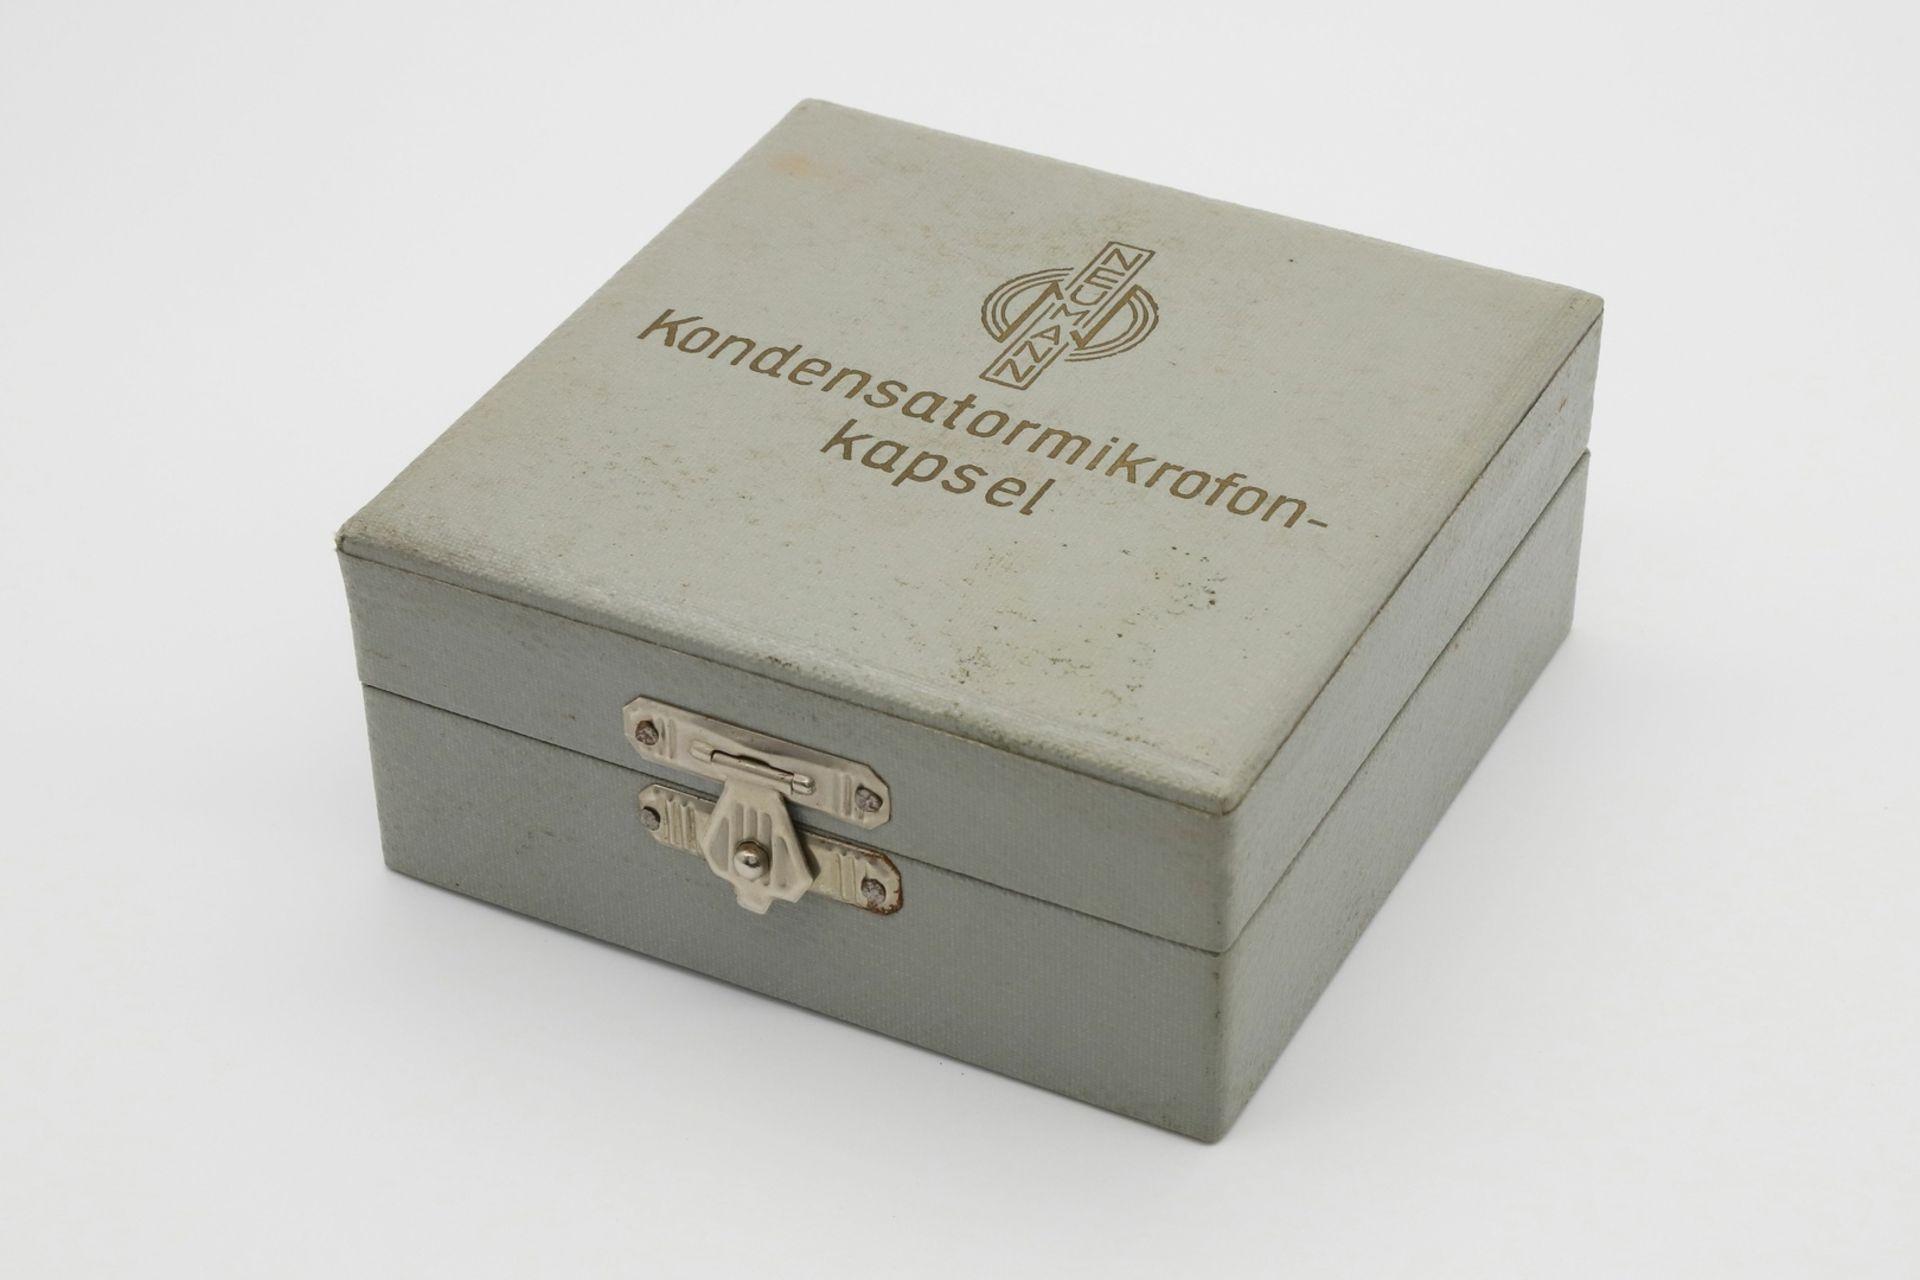 Neumann Kondensatormikrofonkapsel M58, um 1960 - Bild 5 aus 5